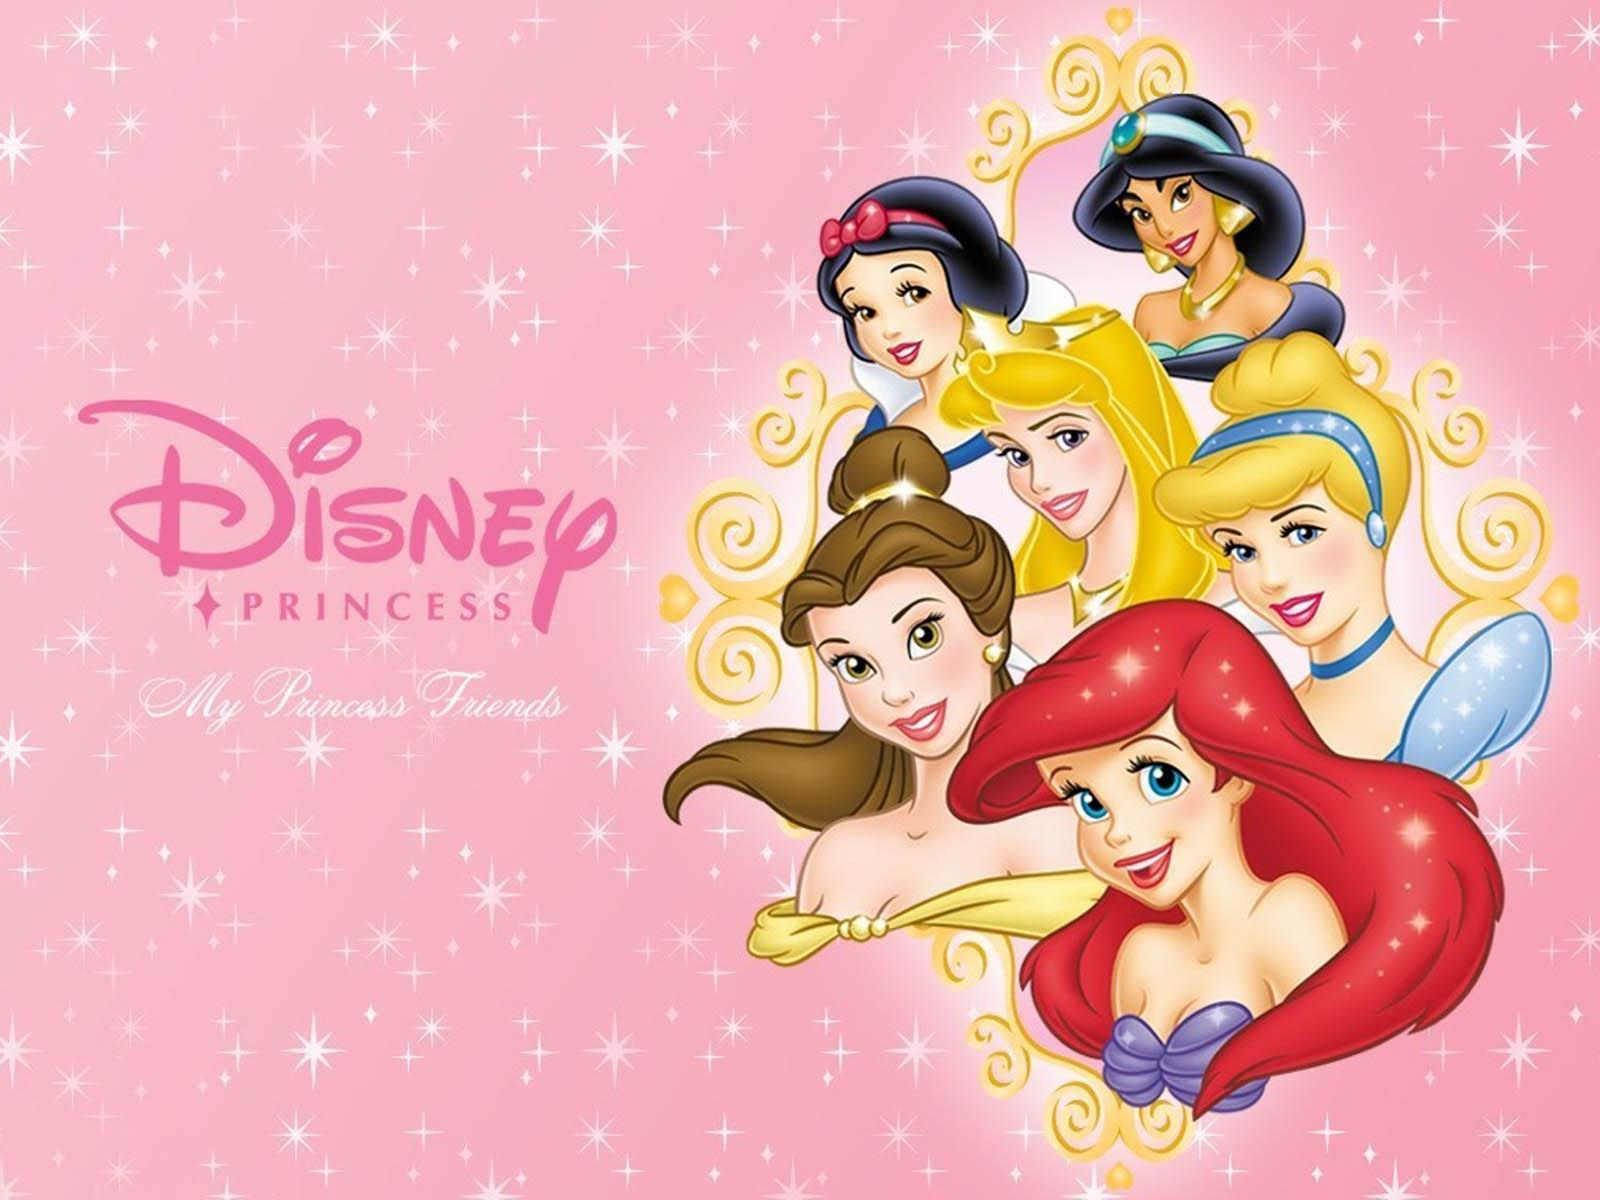 wallpaper Disney Princess Wallpapers 1600x1200